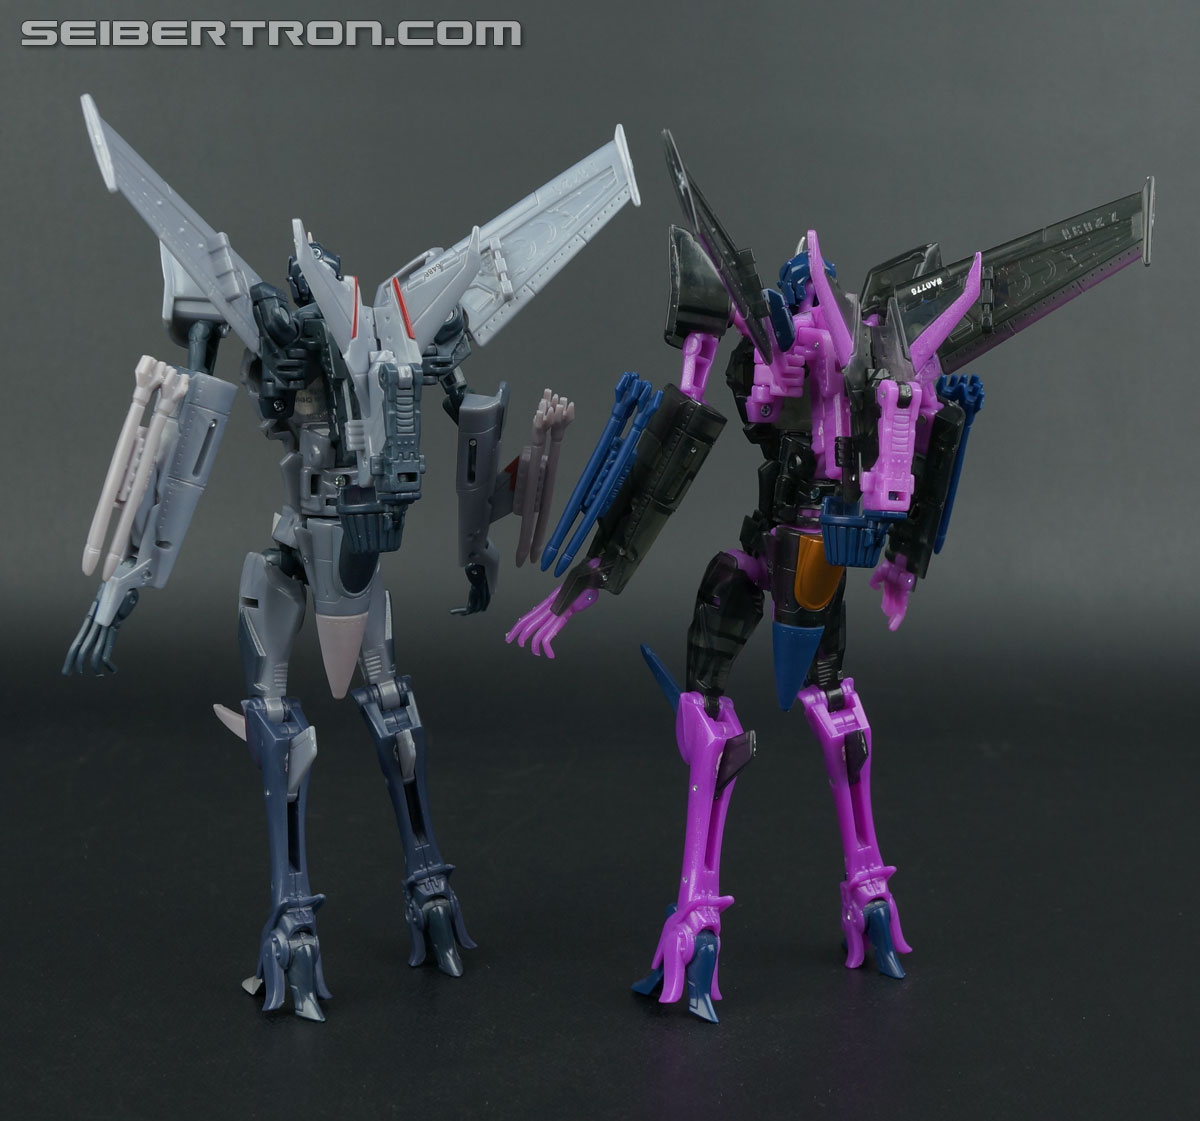 Transformers Prime: Robots In Disguise Dark Energon Starscream (Image #113 of 128)